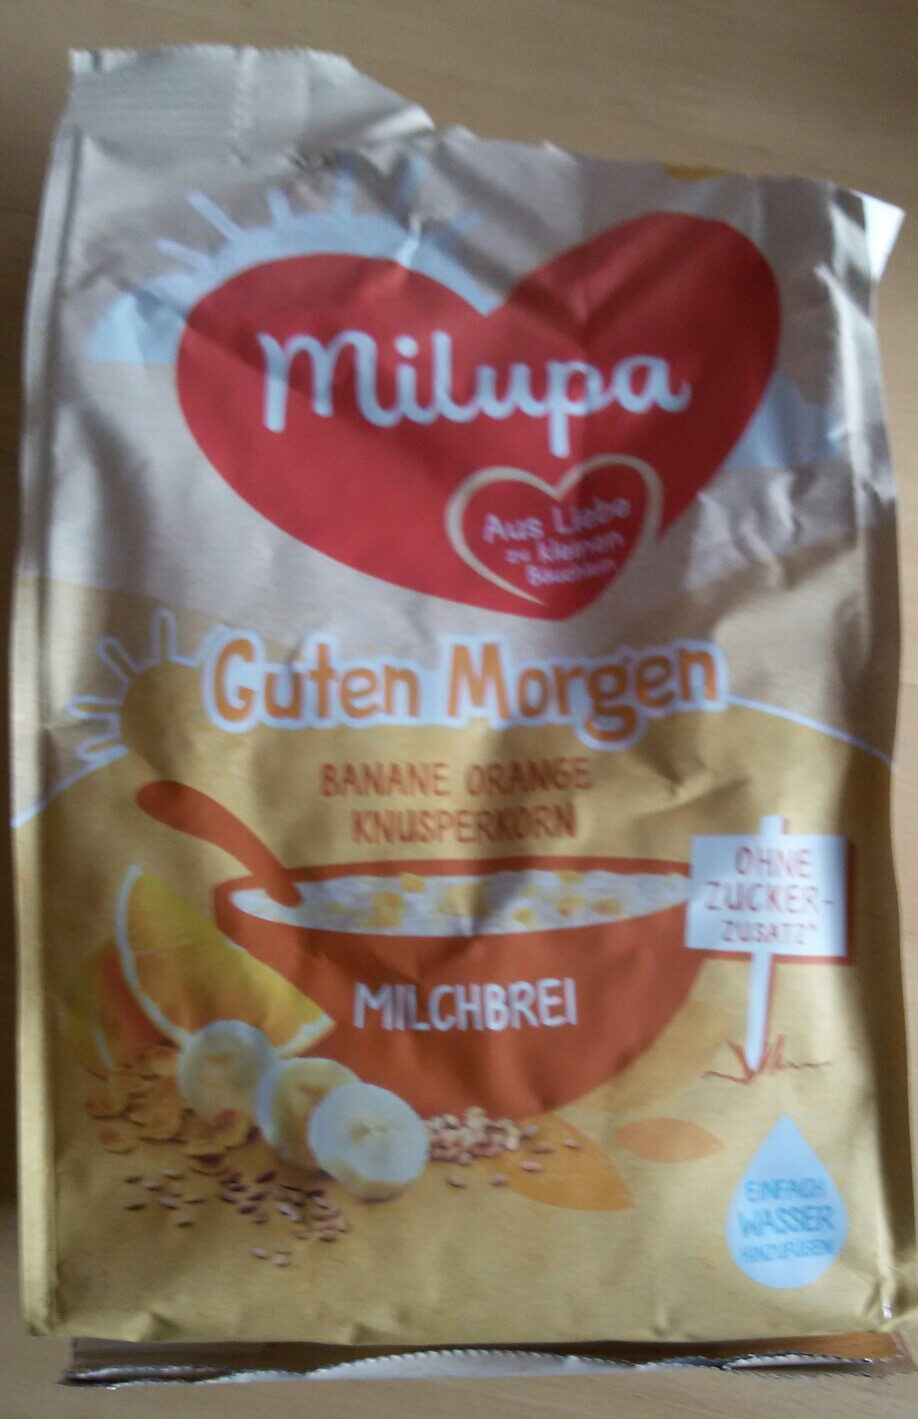 Guten Morgen Milchbrei, Banane, Orange, Knusperkorn - Produkt - de